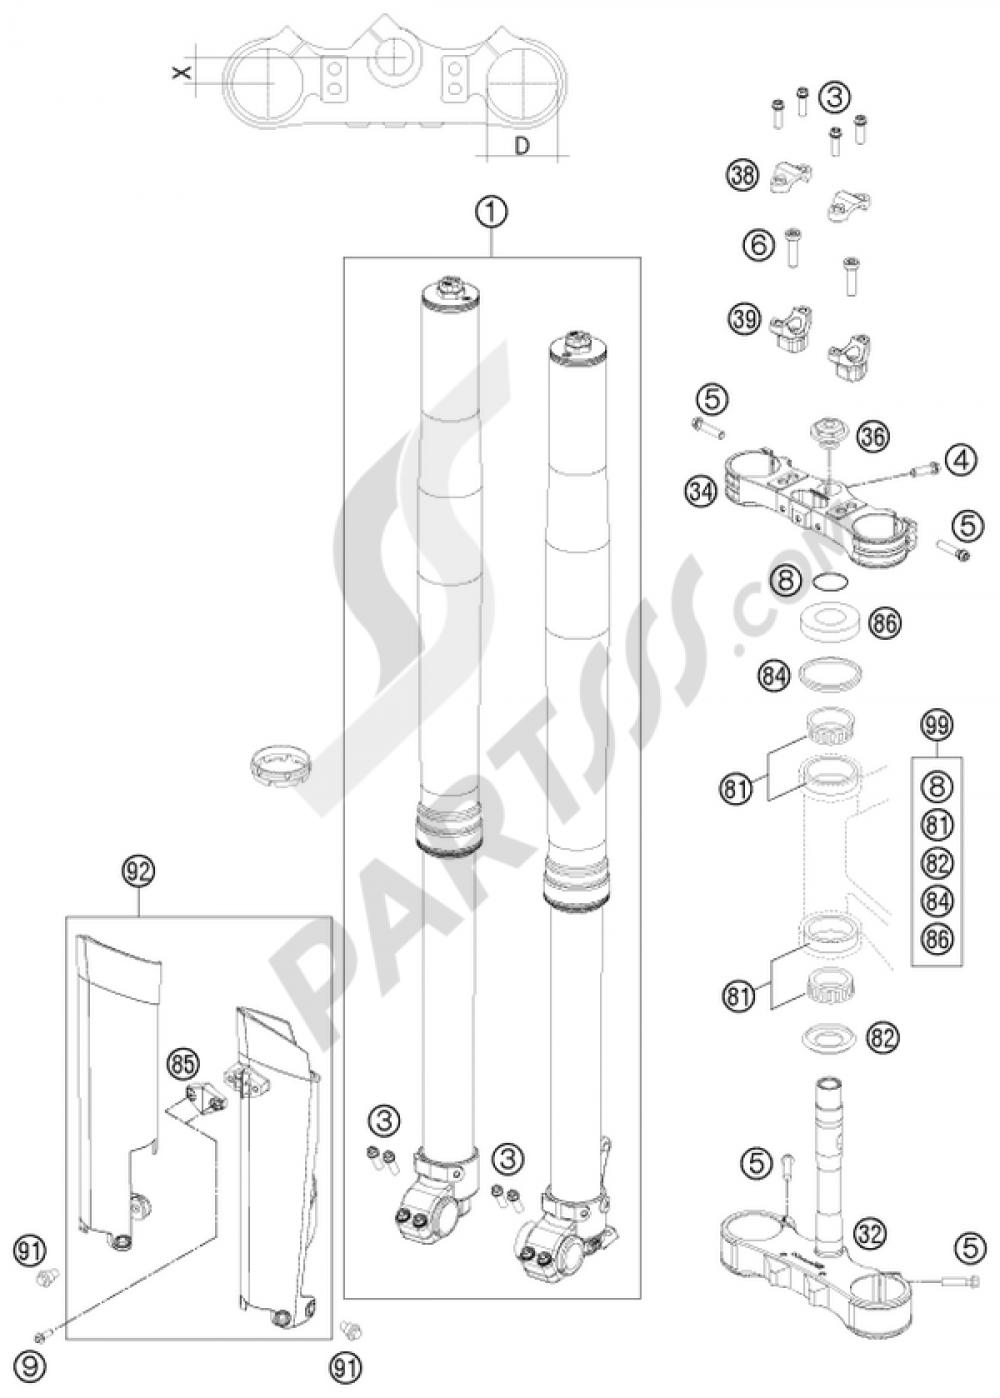 Front Fork Triple Clamp Ktm 450 Exc Factory Edit 2011 Eu Wiring Diagram